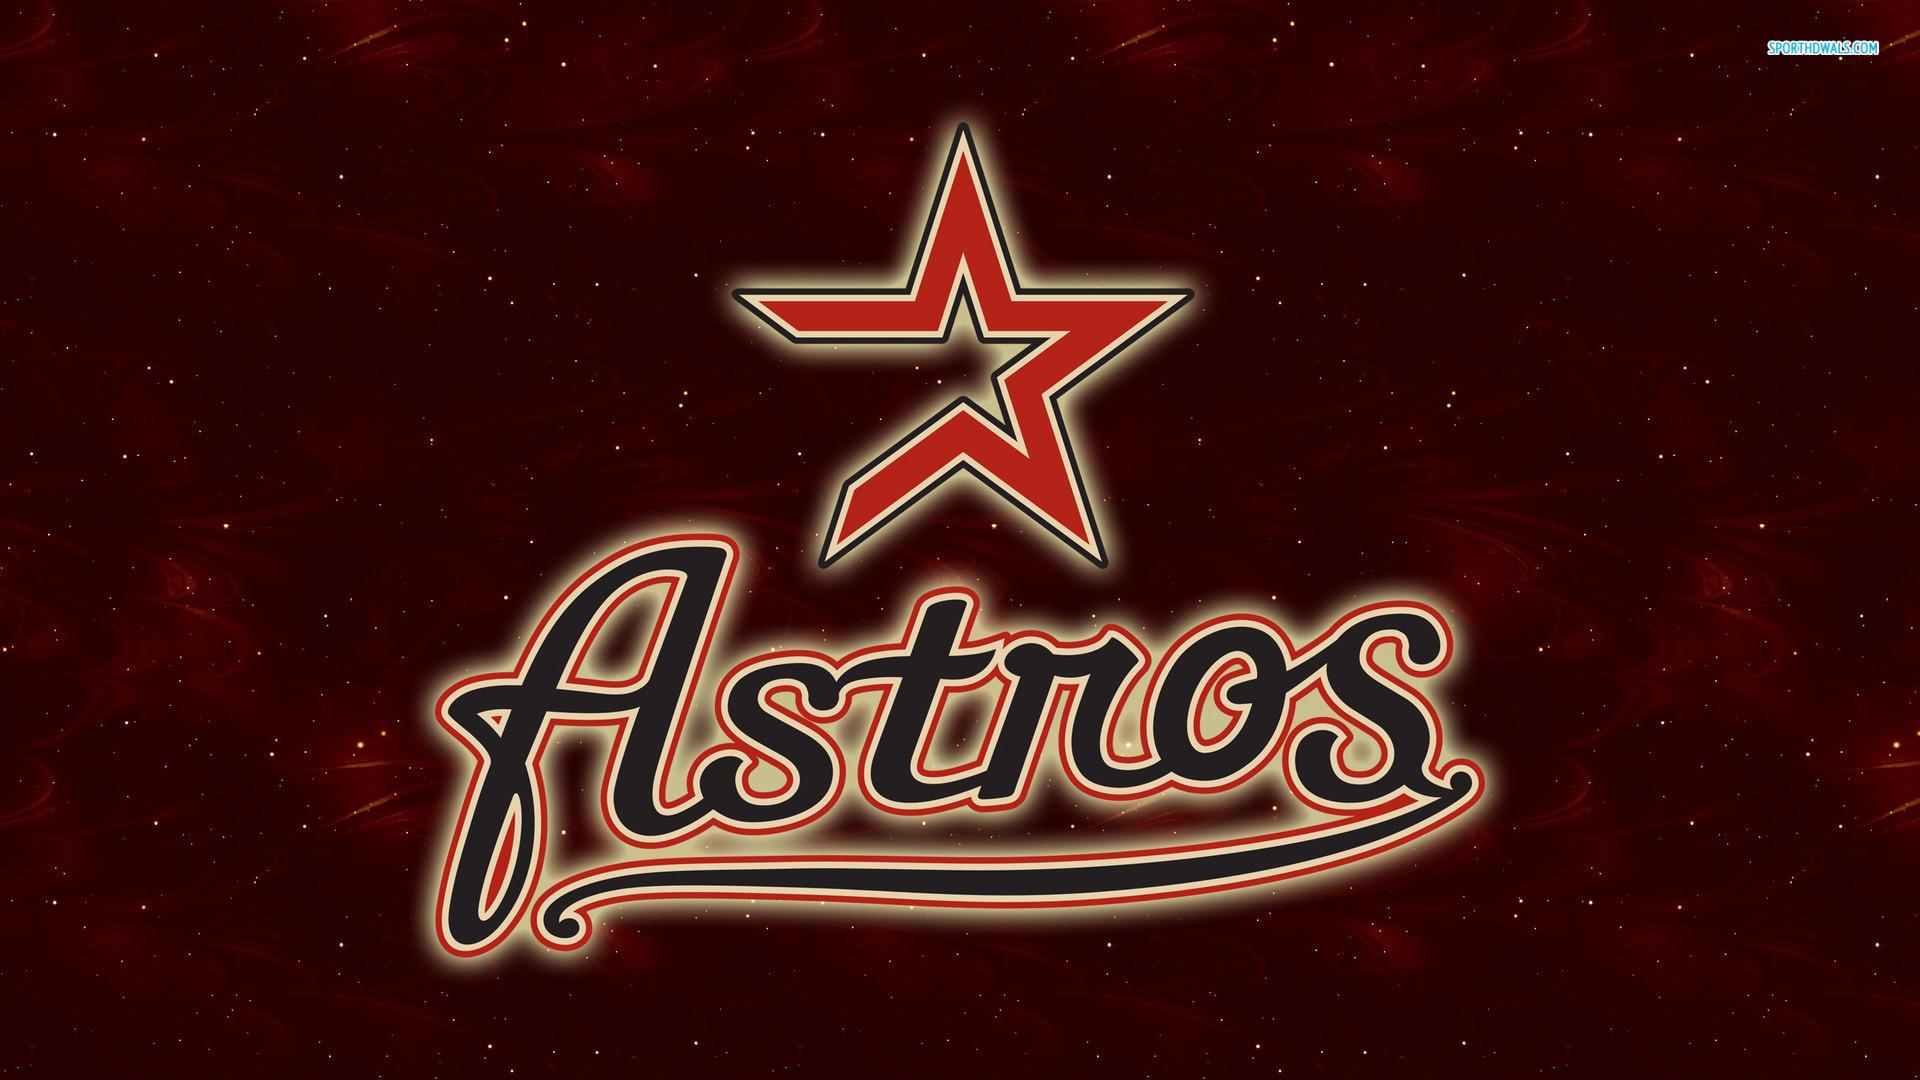 Baseball, Mlb, Houston Astros Baseball Logo, Sports, Houston Astros